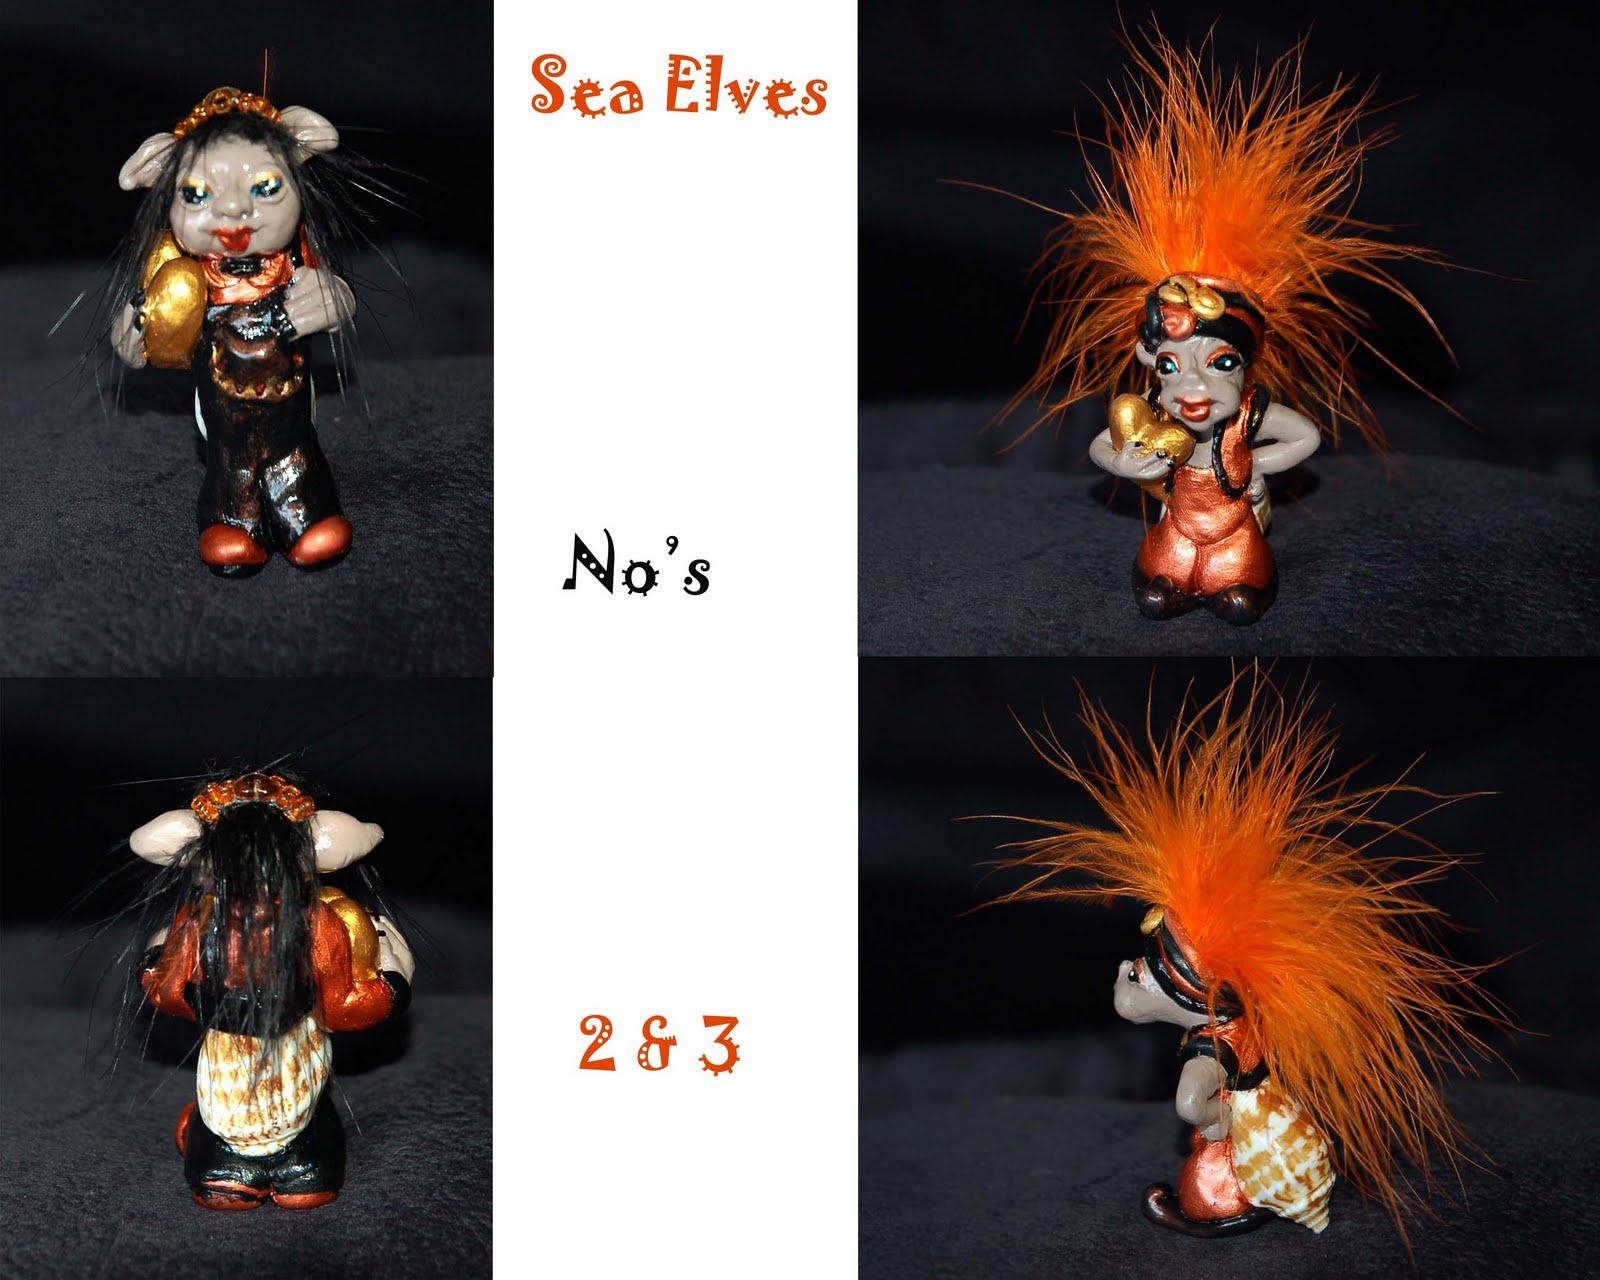 Sea%2BElf%2BNo.%2B2%2B%252526%2B3%2Bjpg Brown, james   Greatest Hits   Vol.3